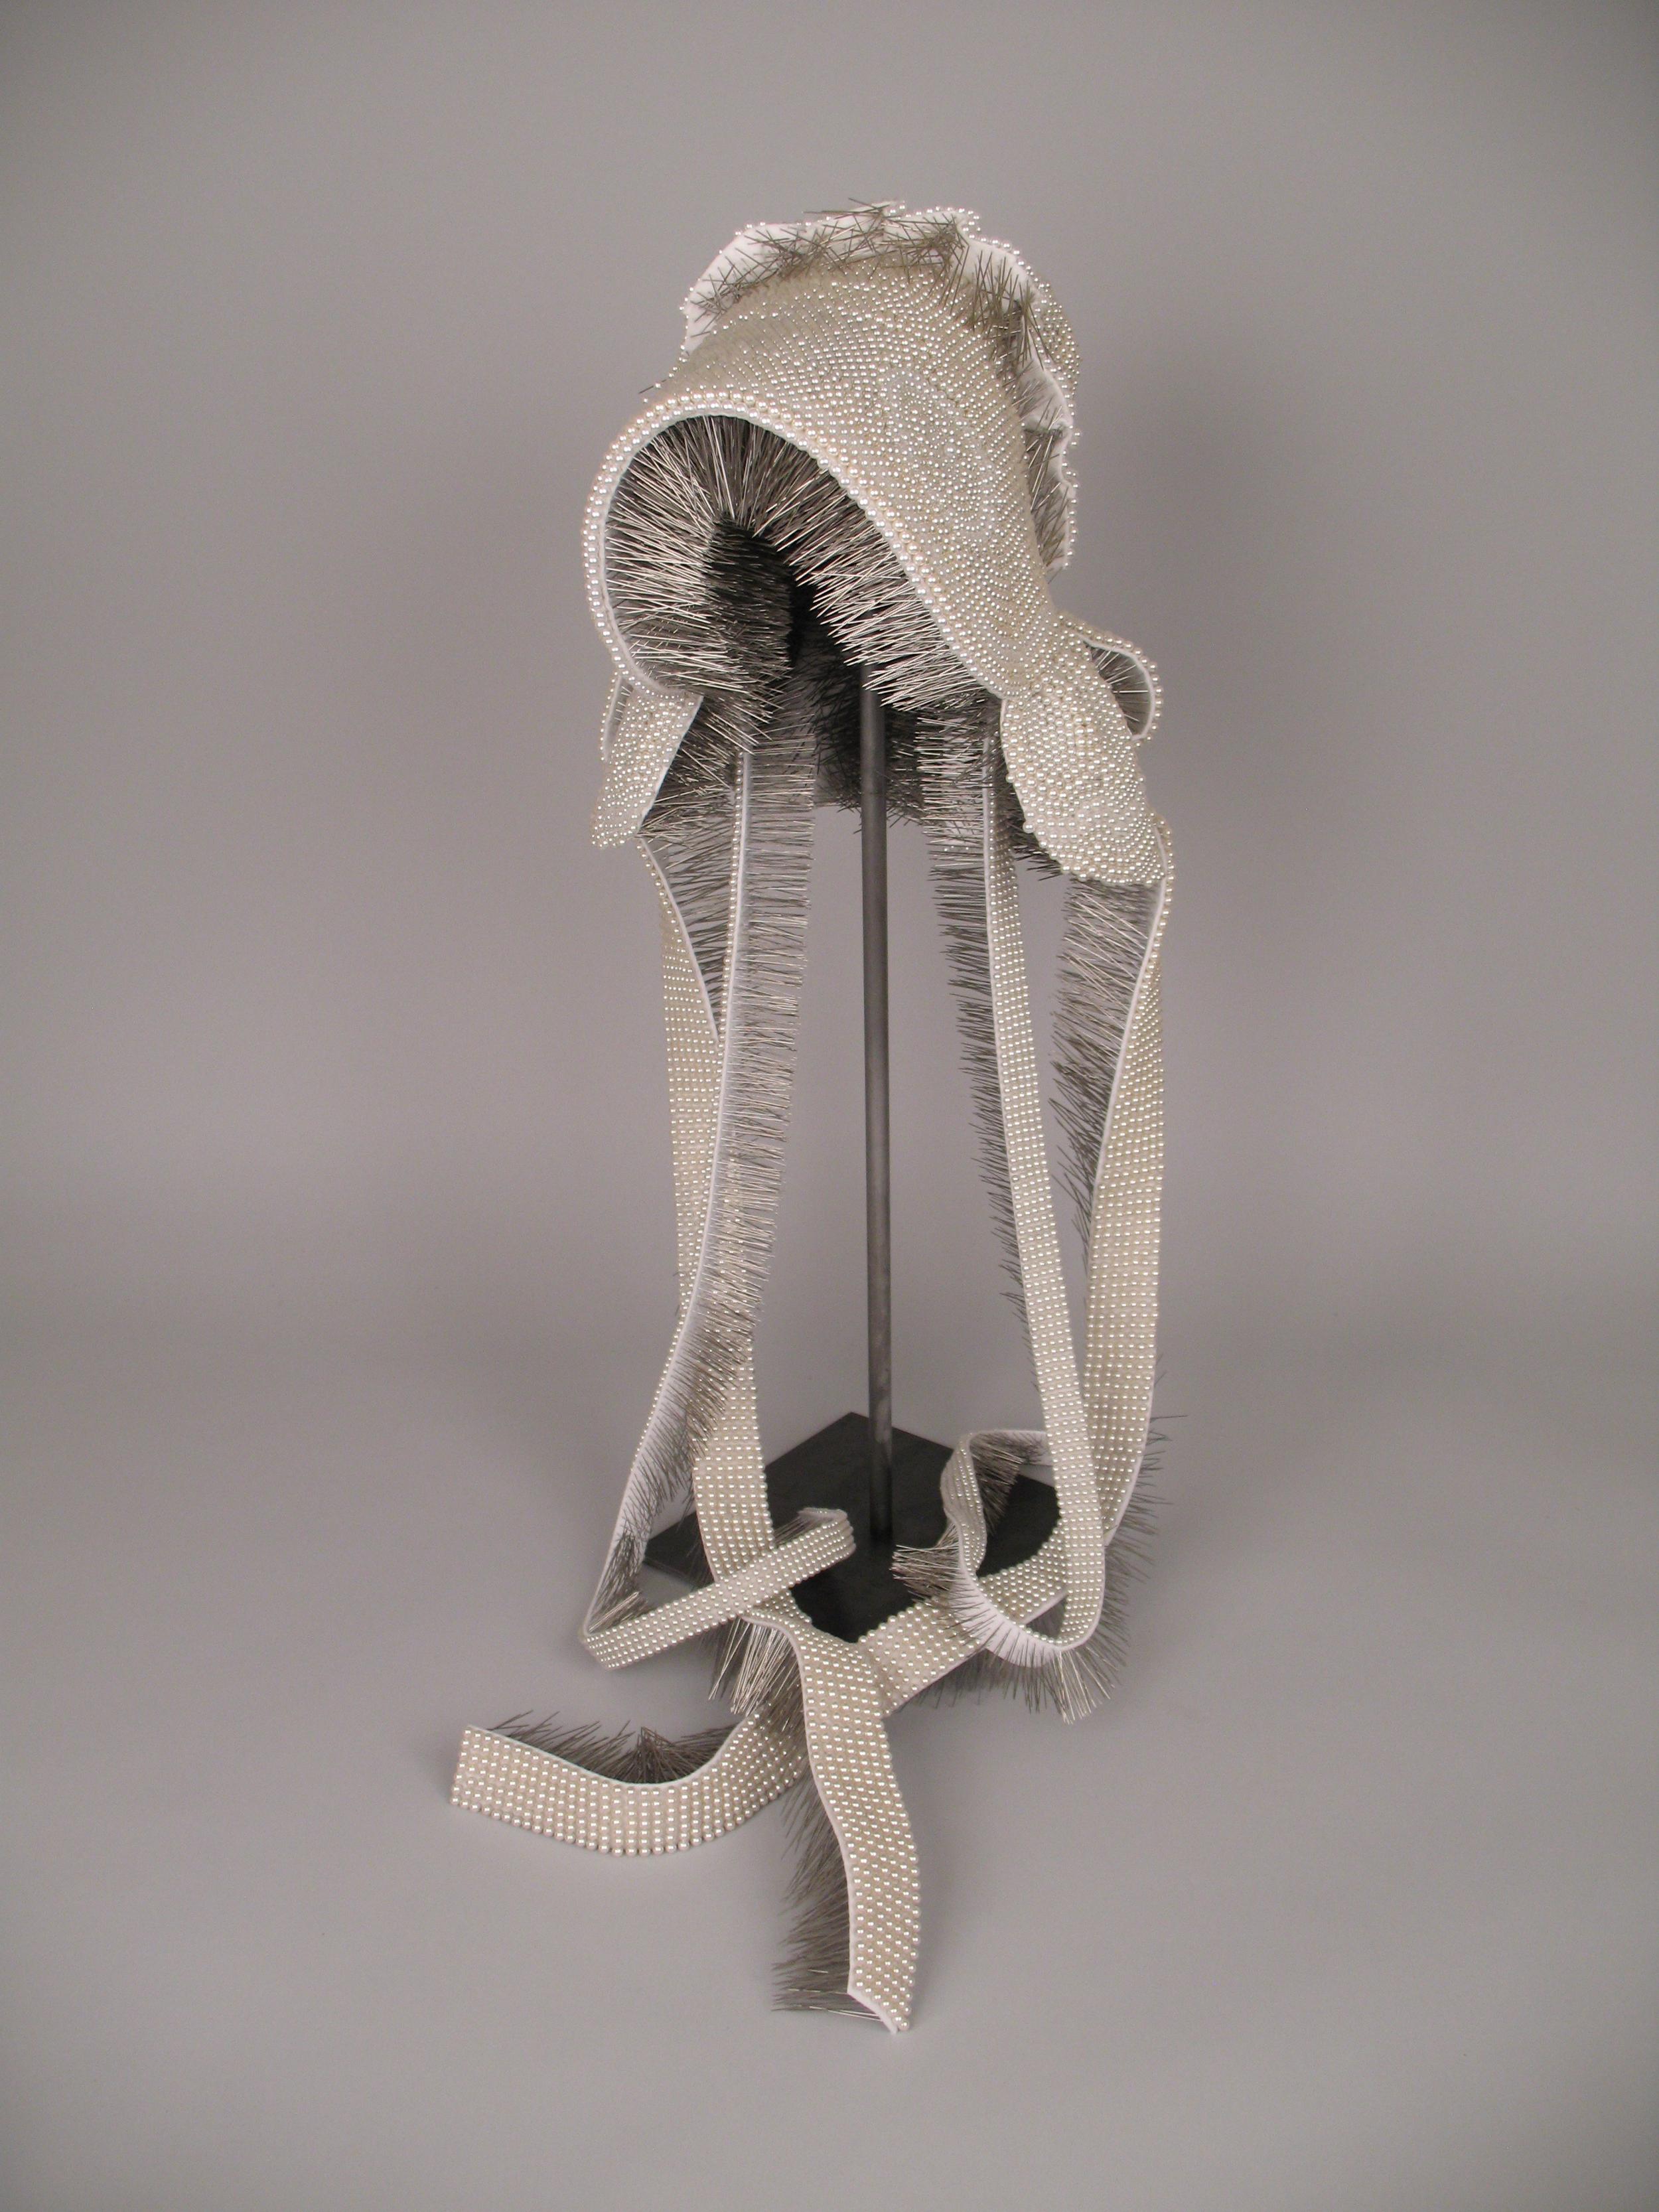 "Seer Bonnet XVI  16,194 pearl corsage pins, fabric, steel, 29"" x 12.5"" x 13.5"", 2010-2011"